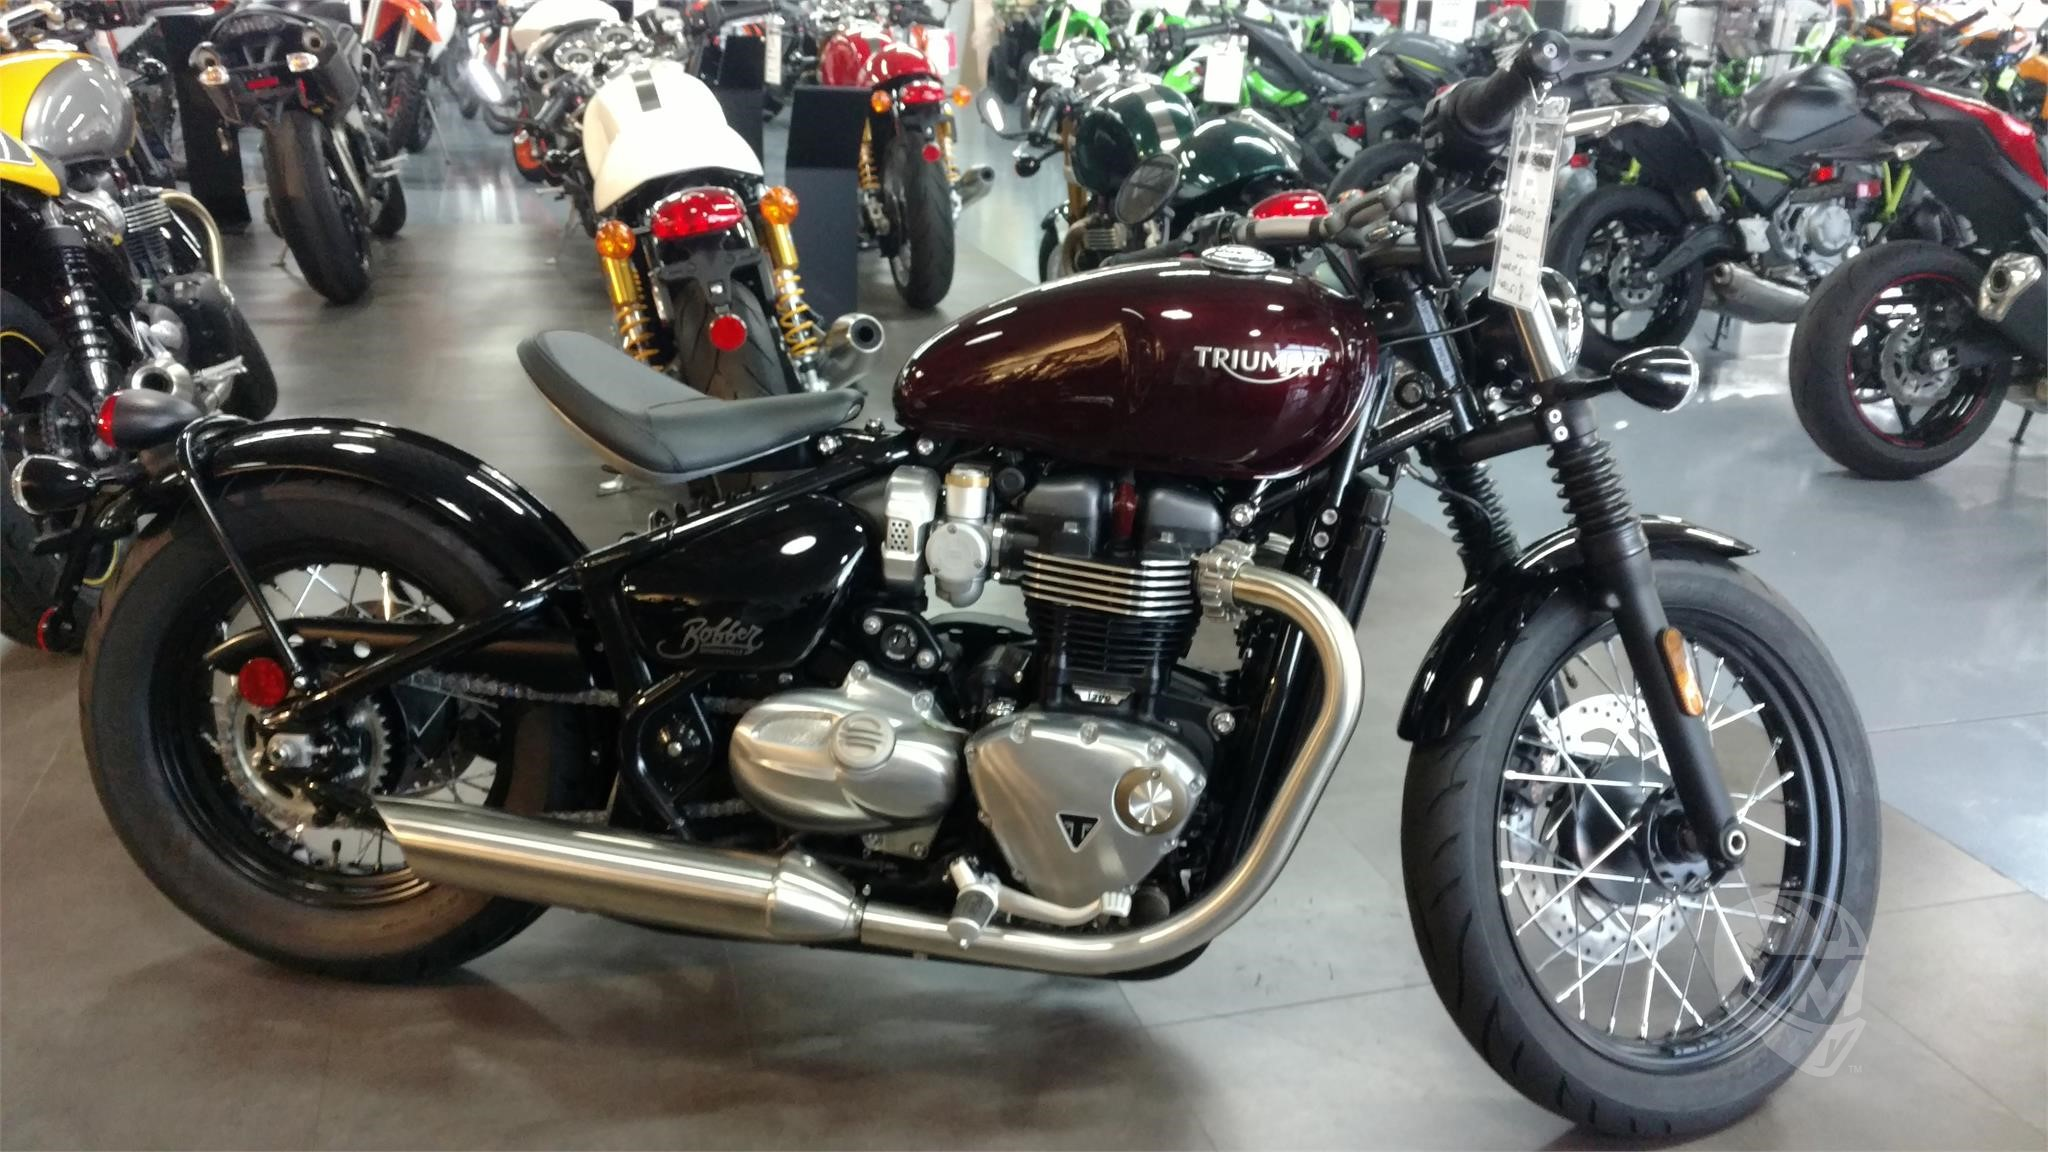 2018 Triumph Bonneville Bobber For Sale In Tucson Arizona